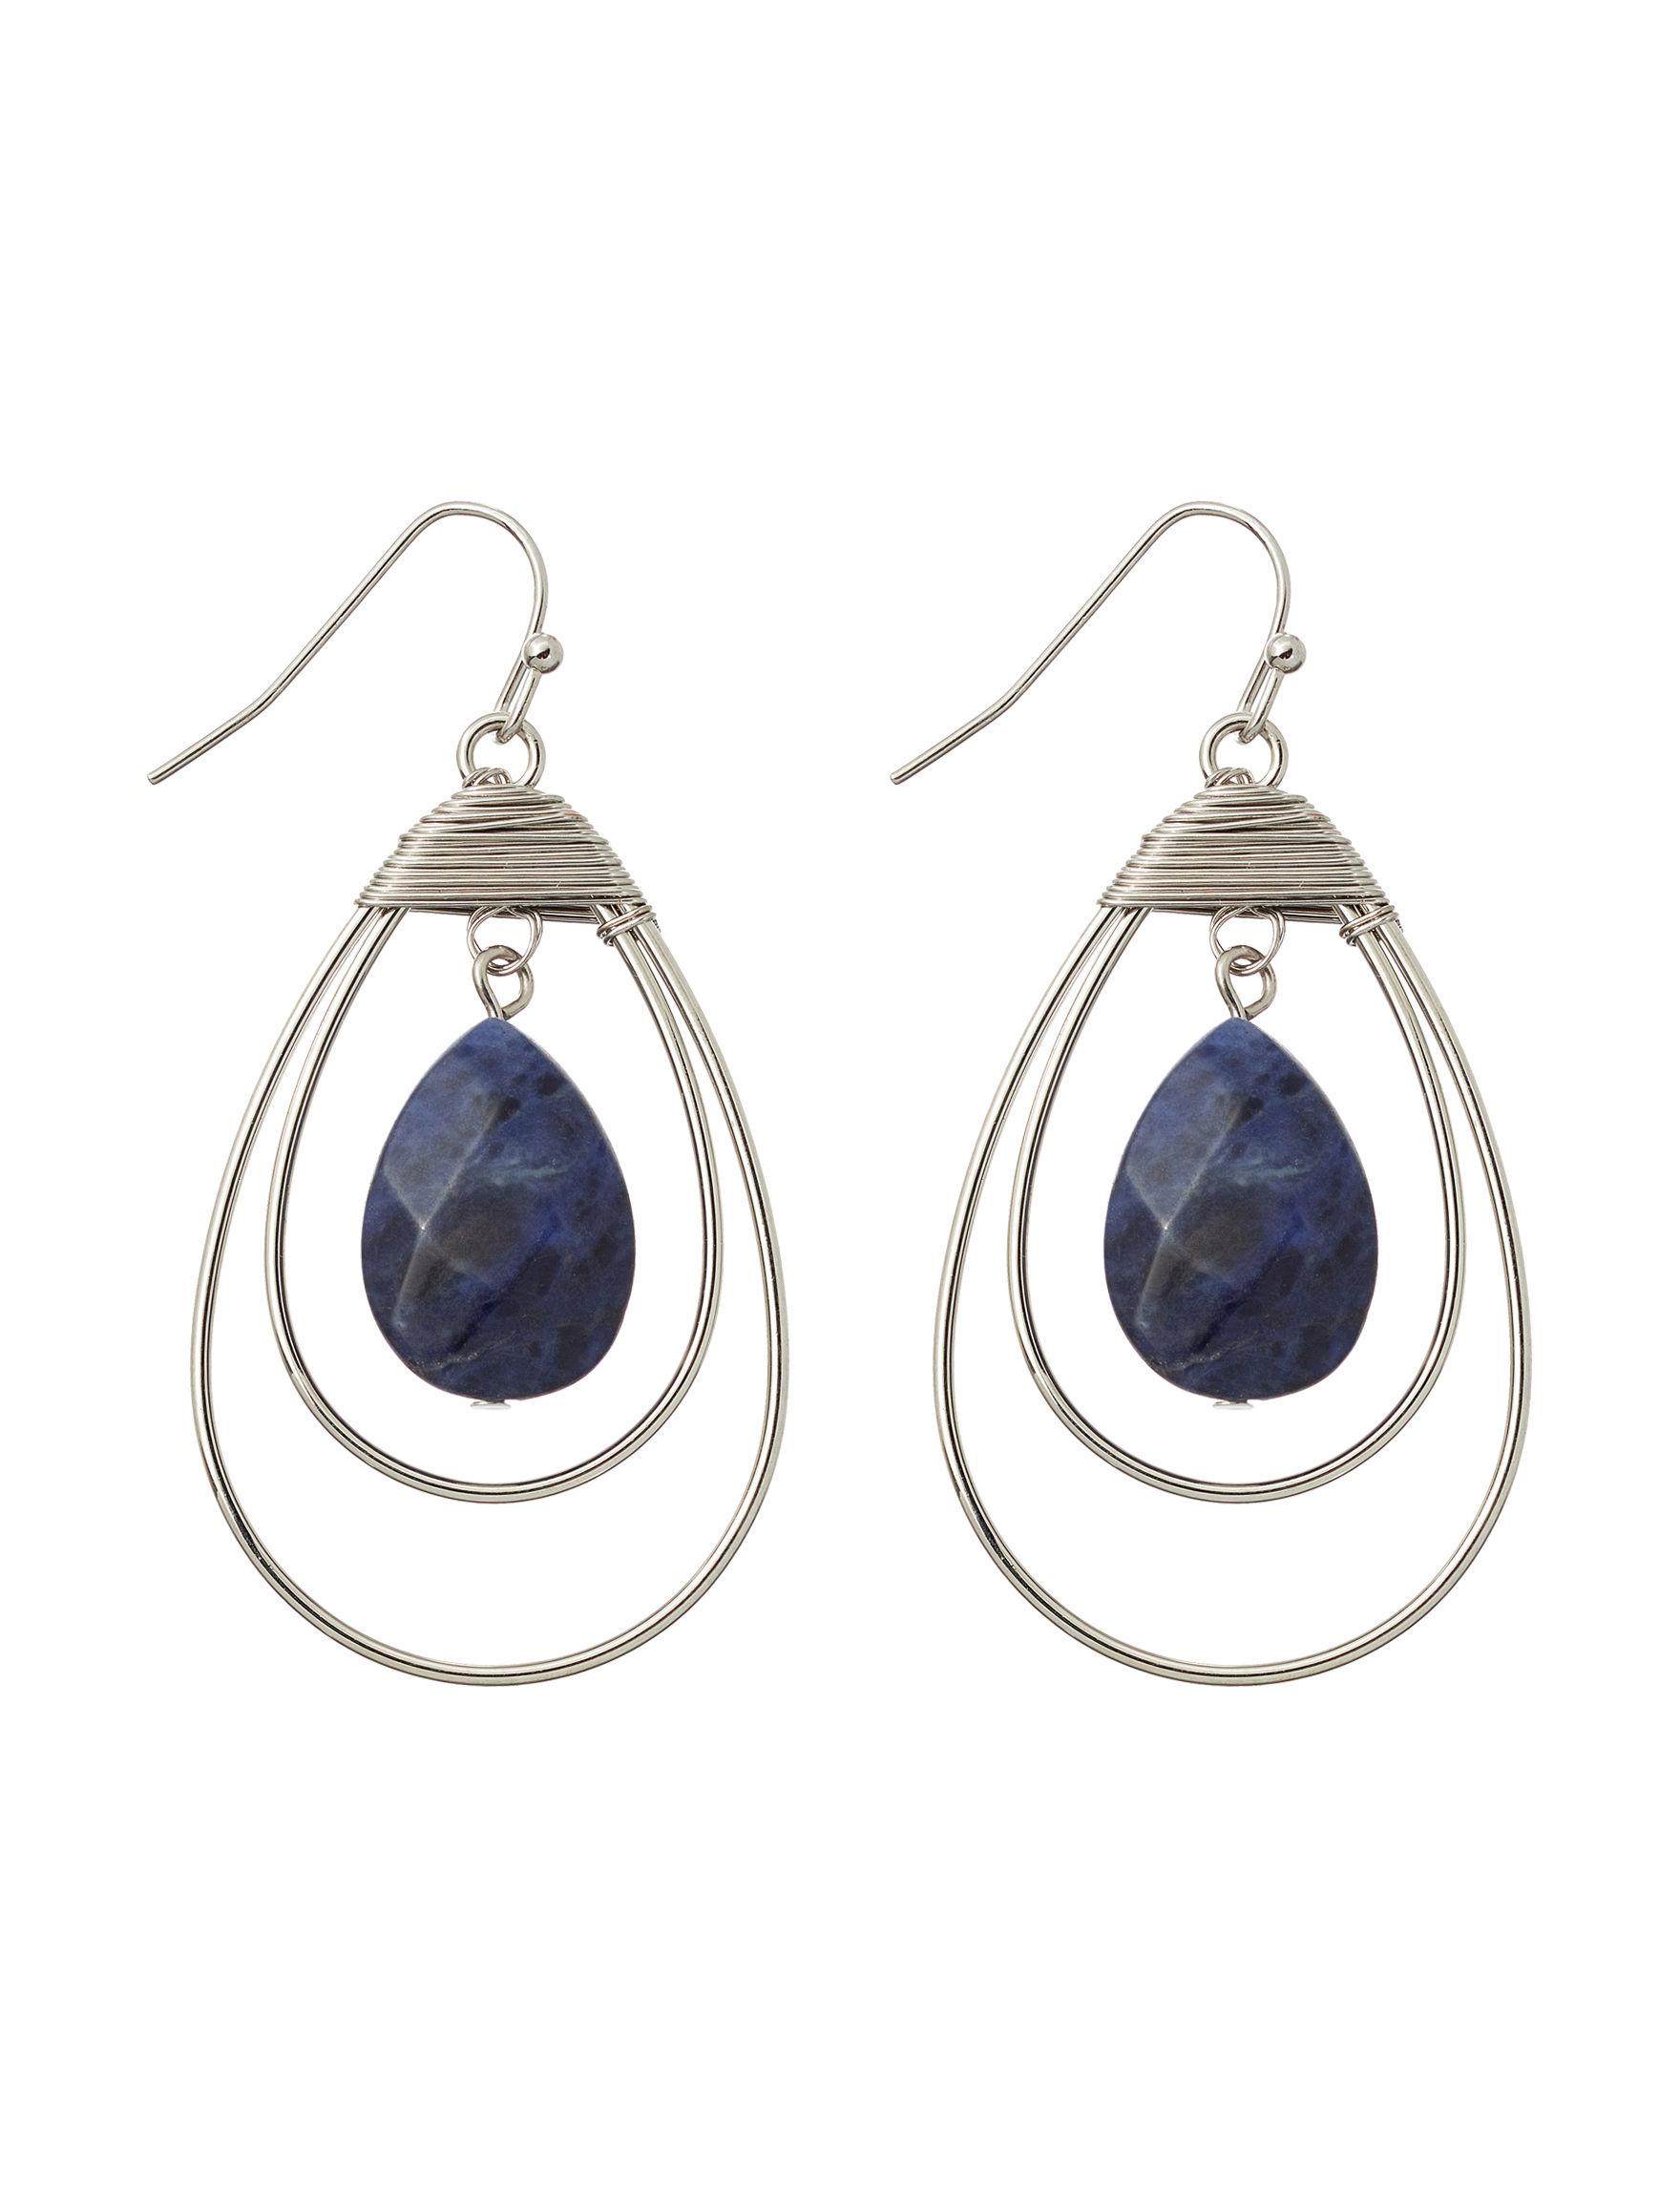 Hannah Silver / Navy Drops Earrings Fashion Jewelry